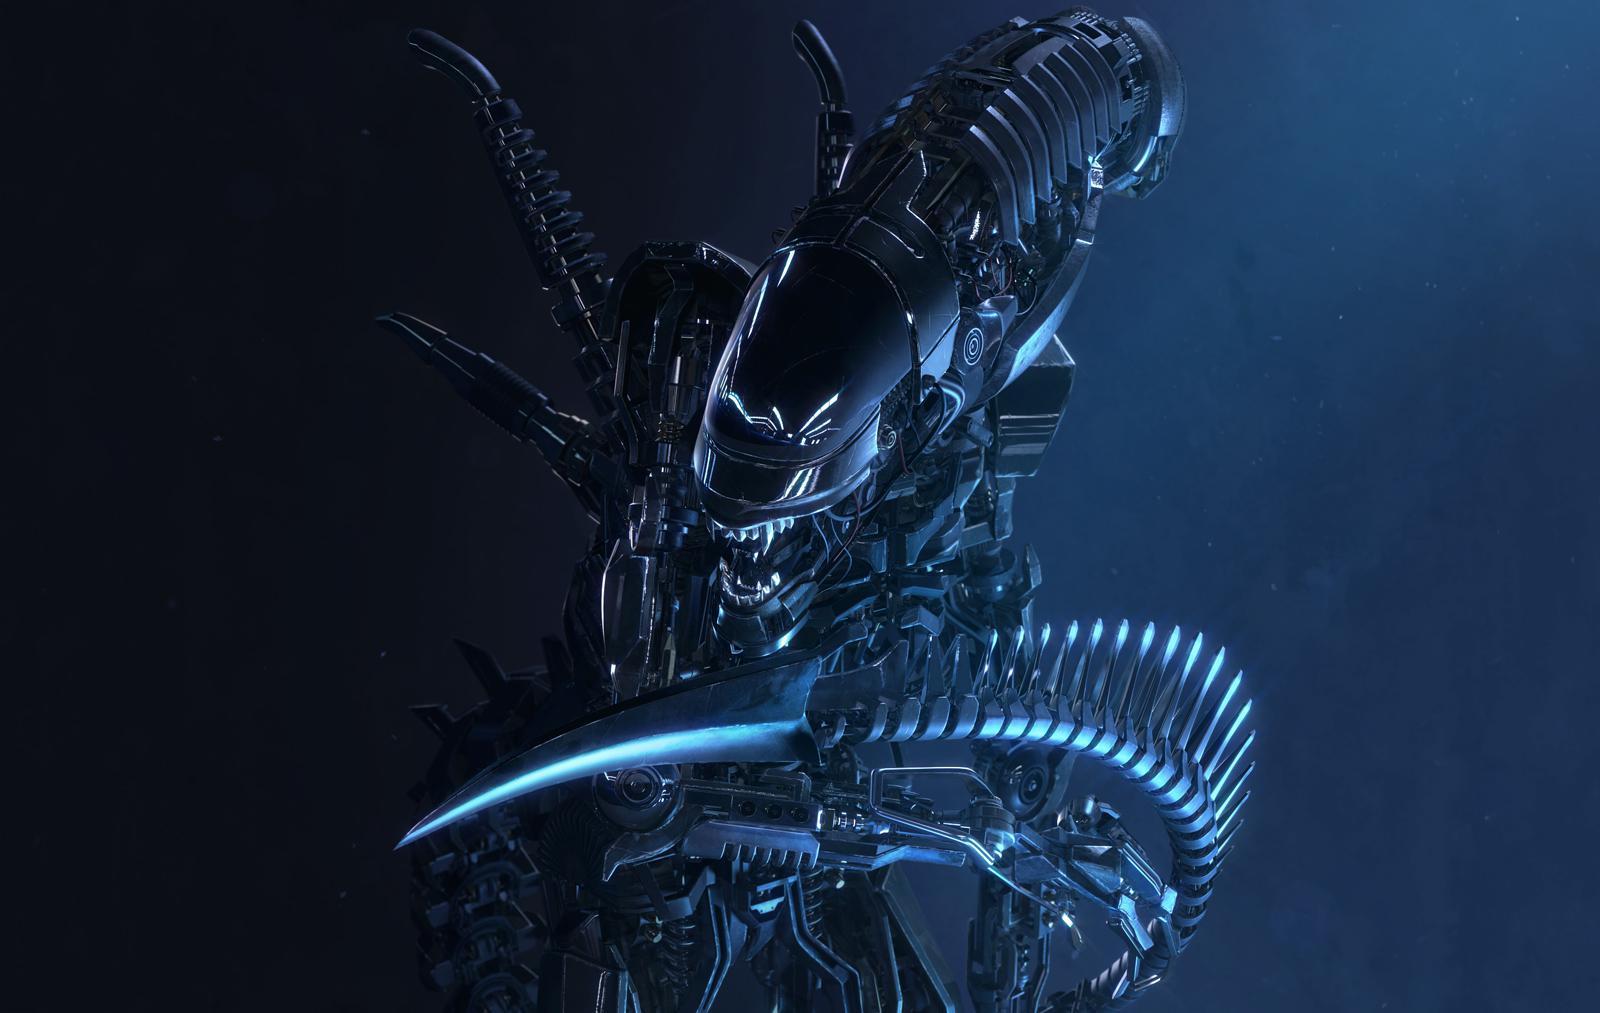 3D Render: Alien Transformer